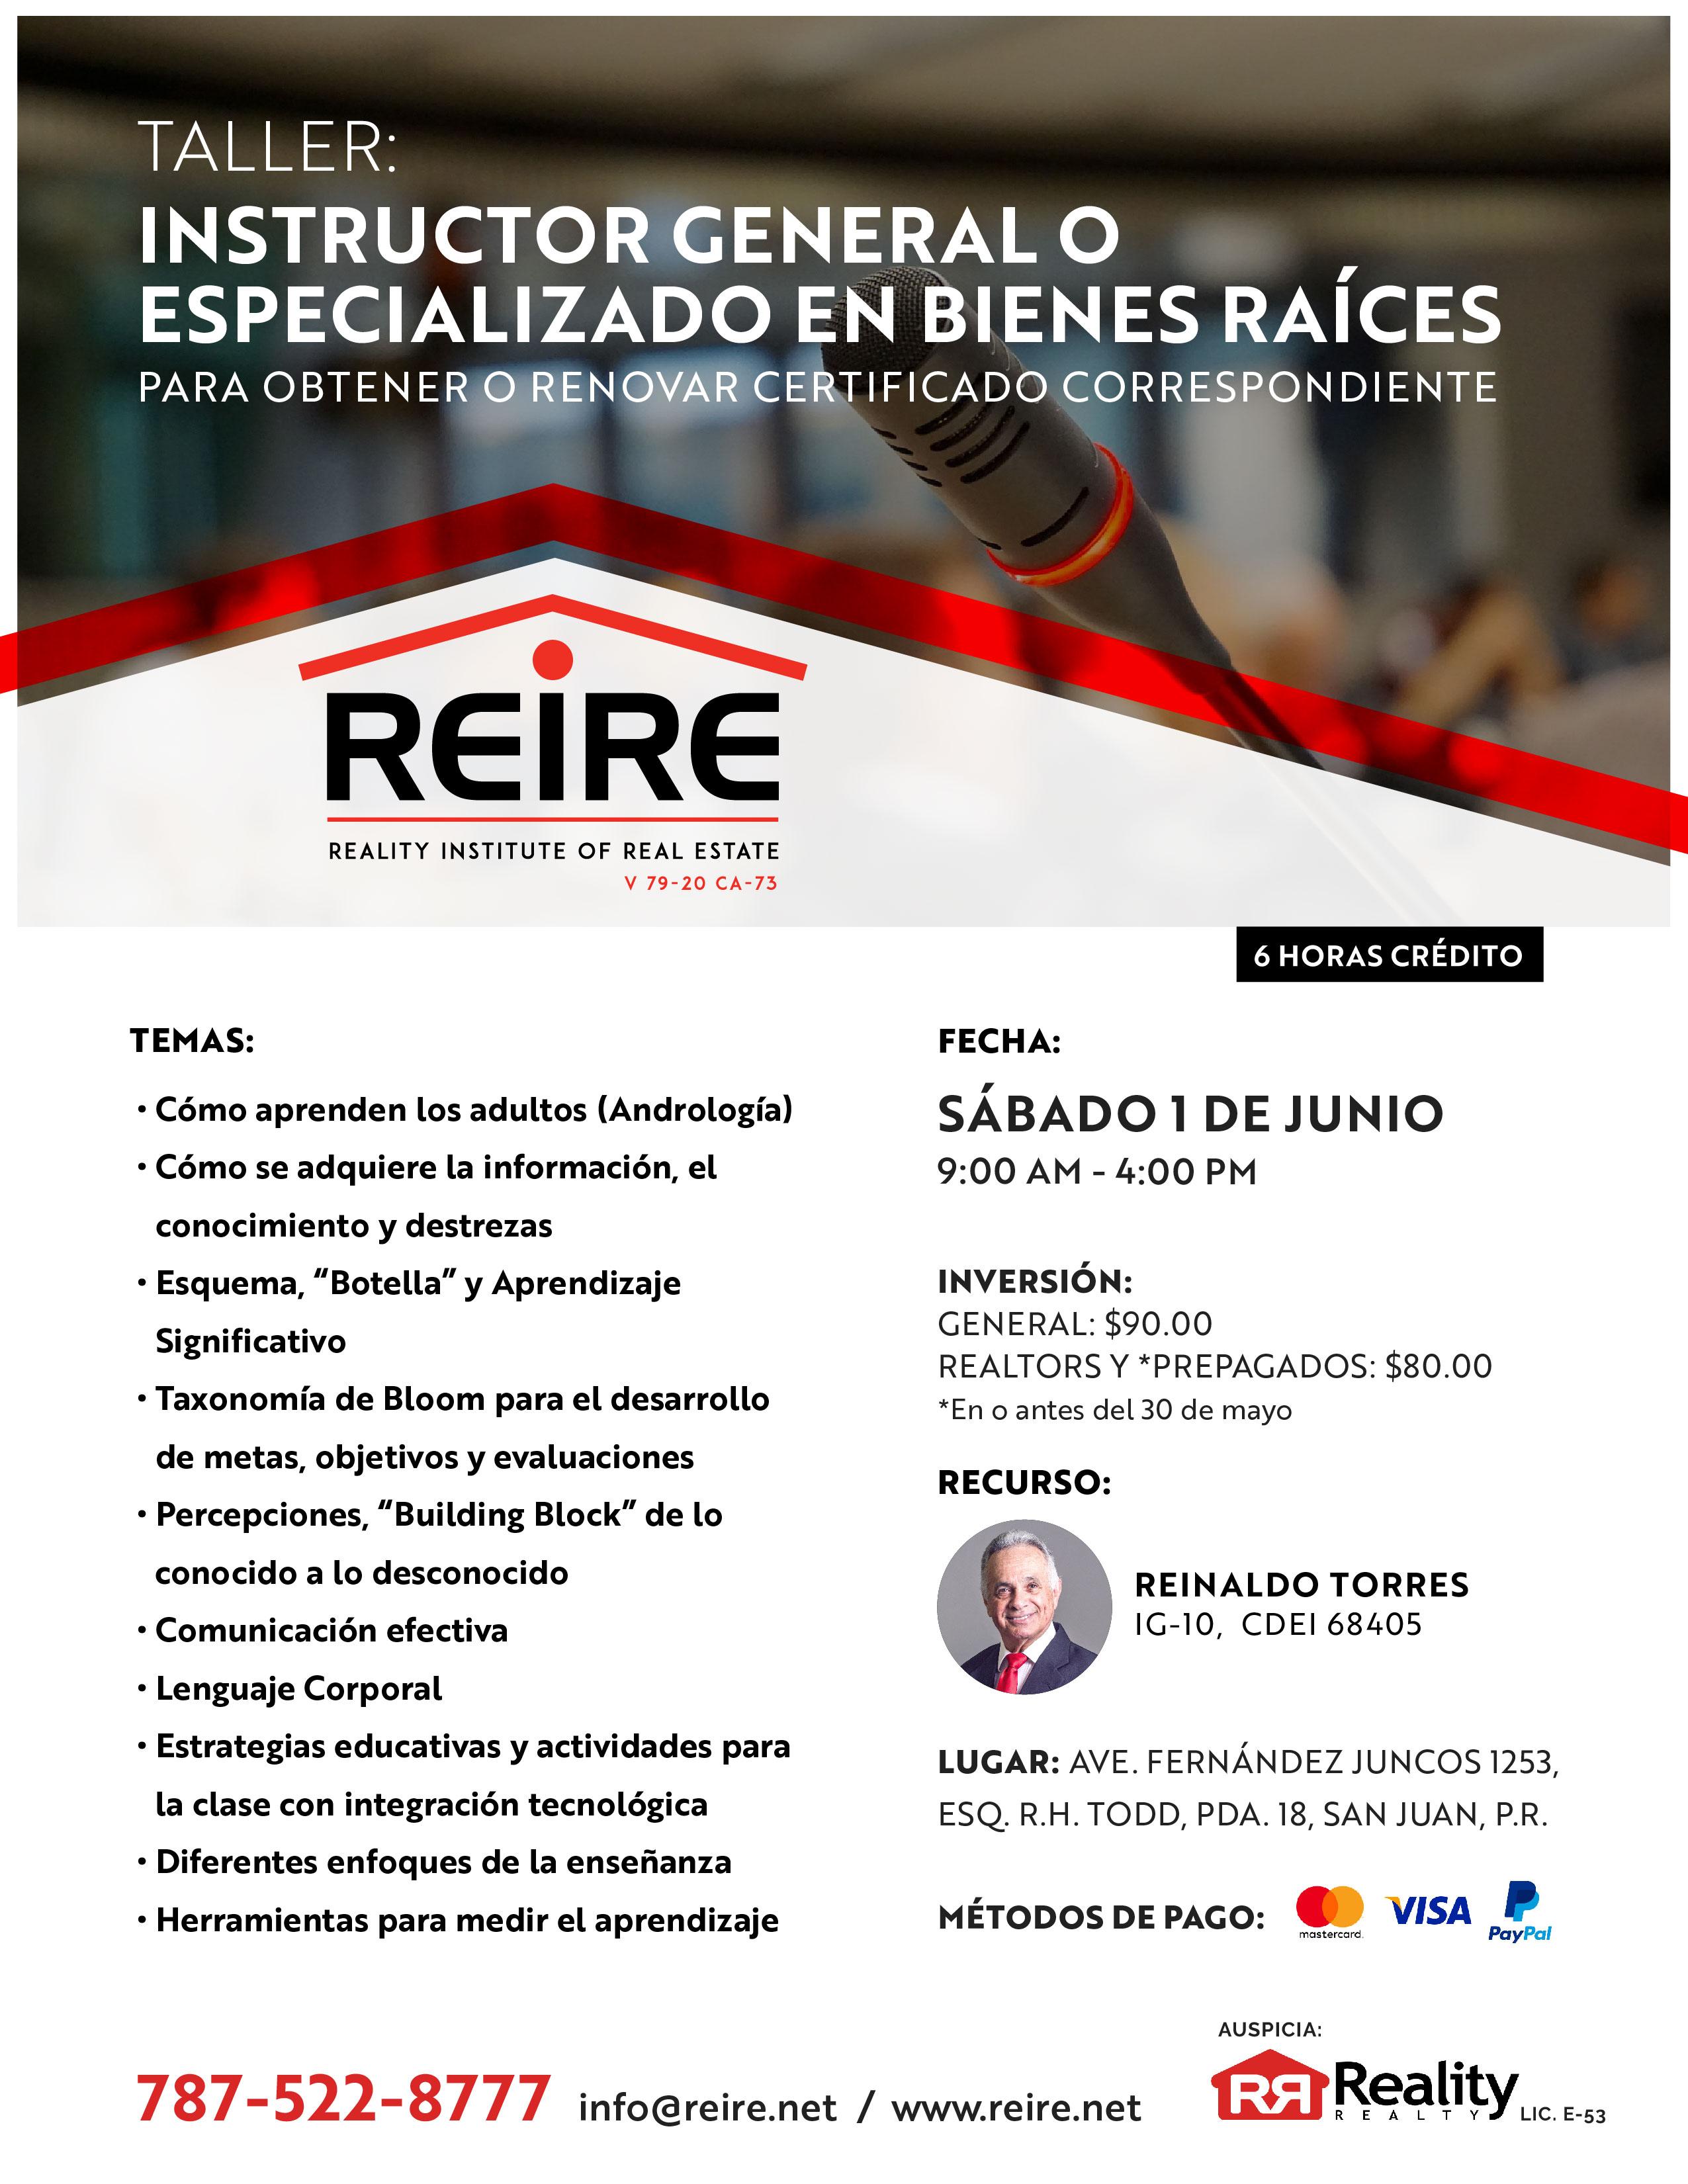 Reire_Instructor_2019-01